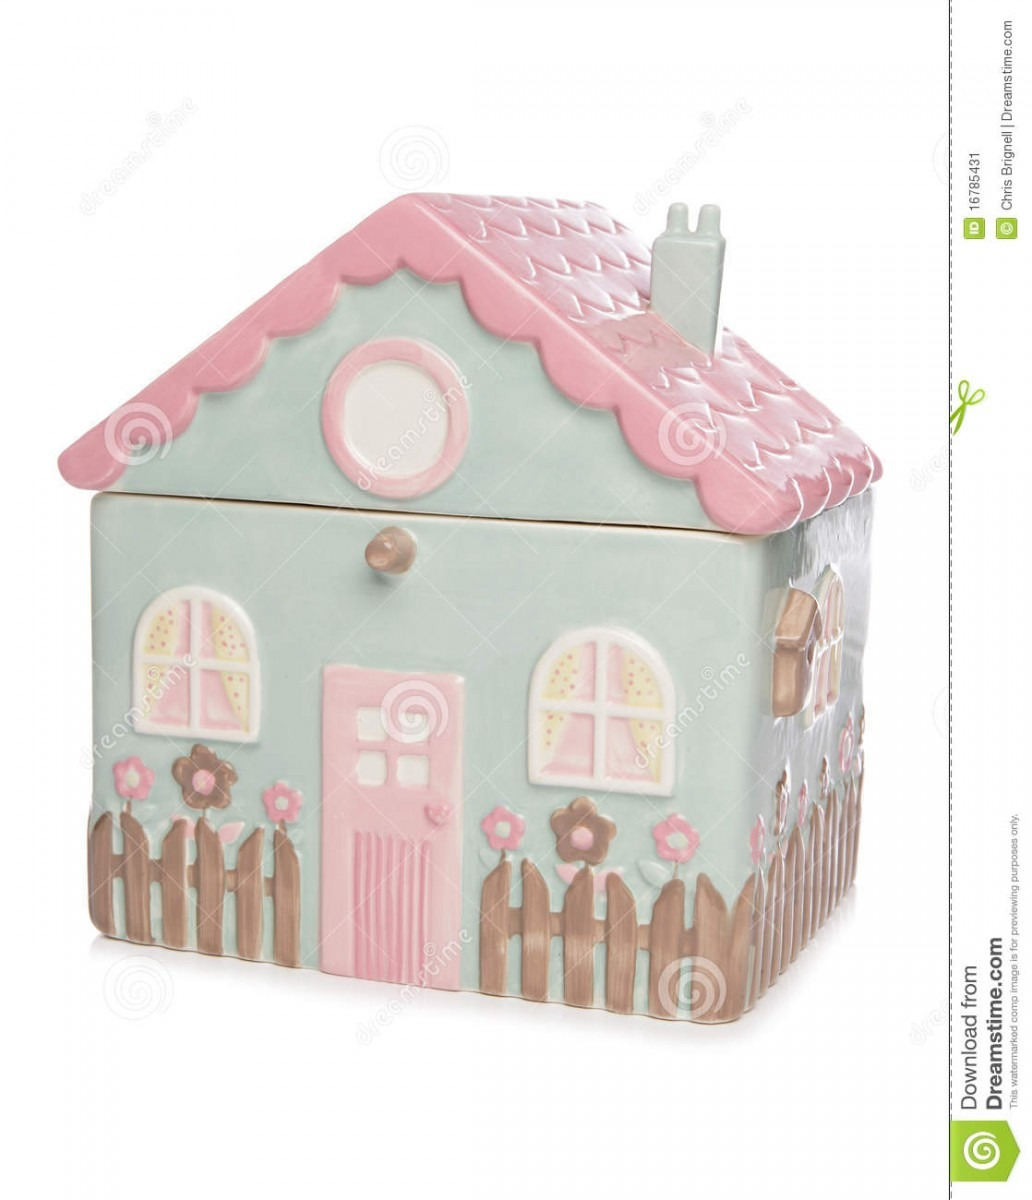 House Cookie Jar Stock Image  Image Of Background, Fresh